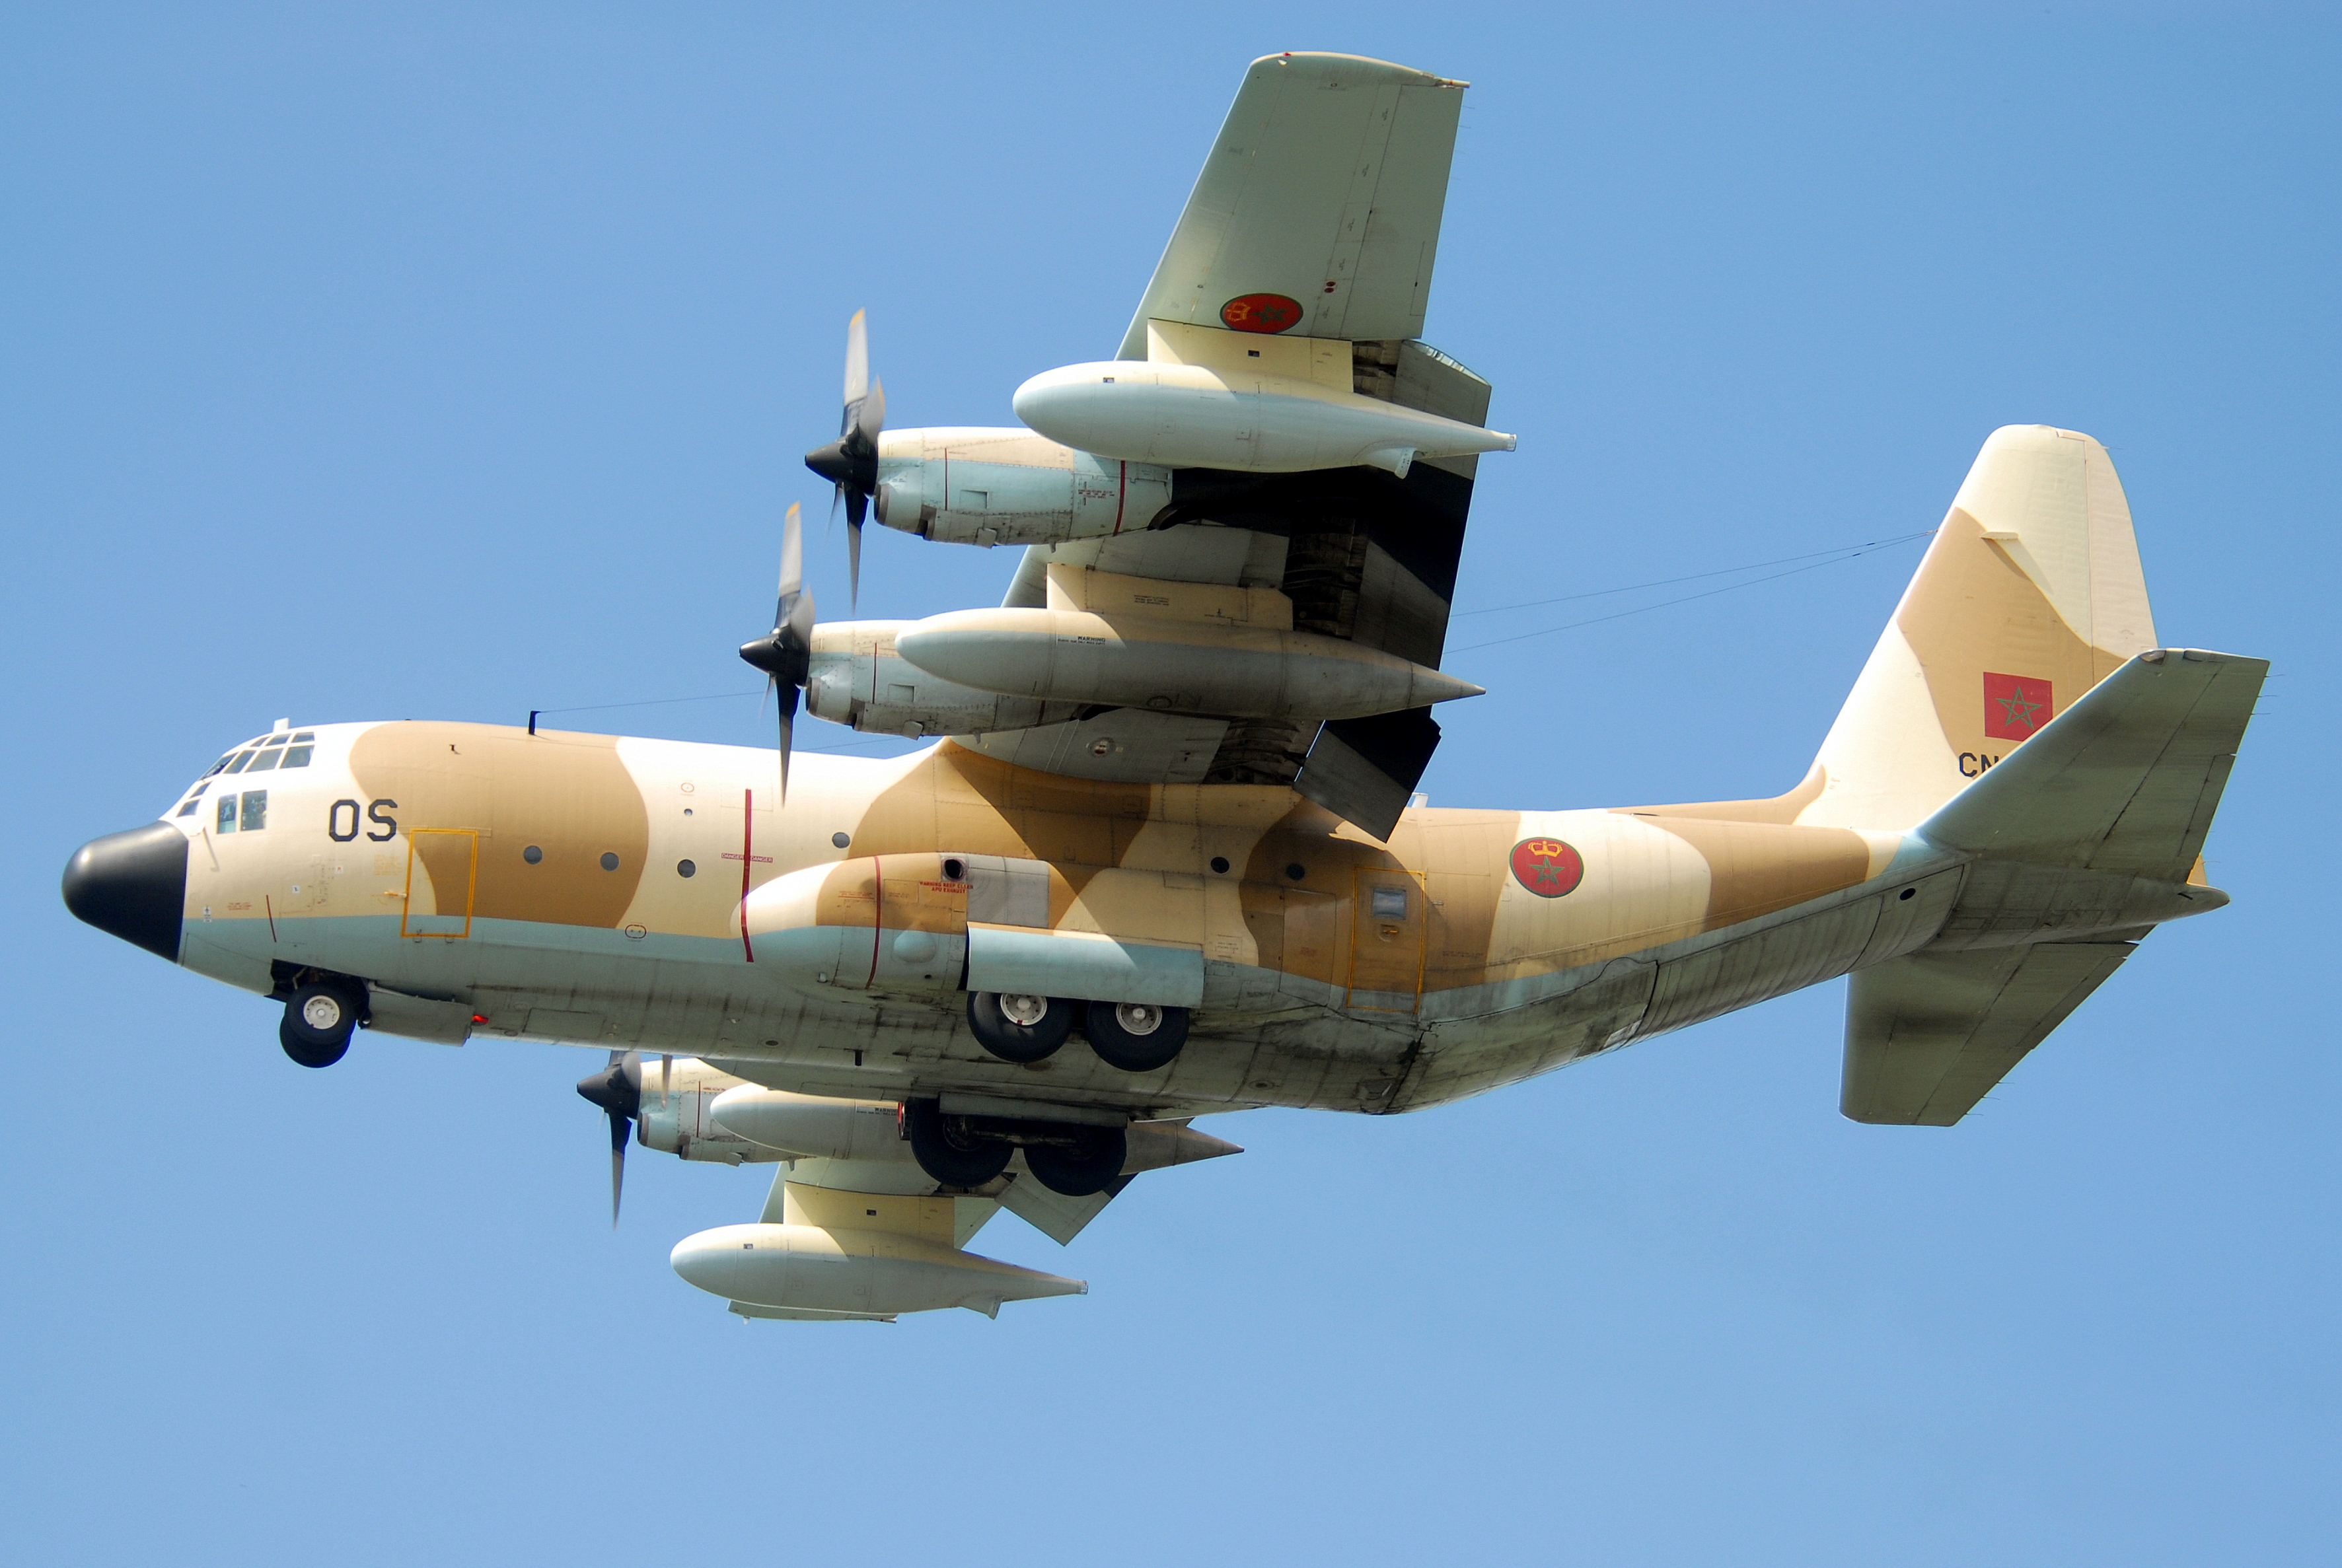 FRA: Photos d'avions de transport - Page 42 51145035789_ce53fe485a_o_d